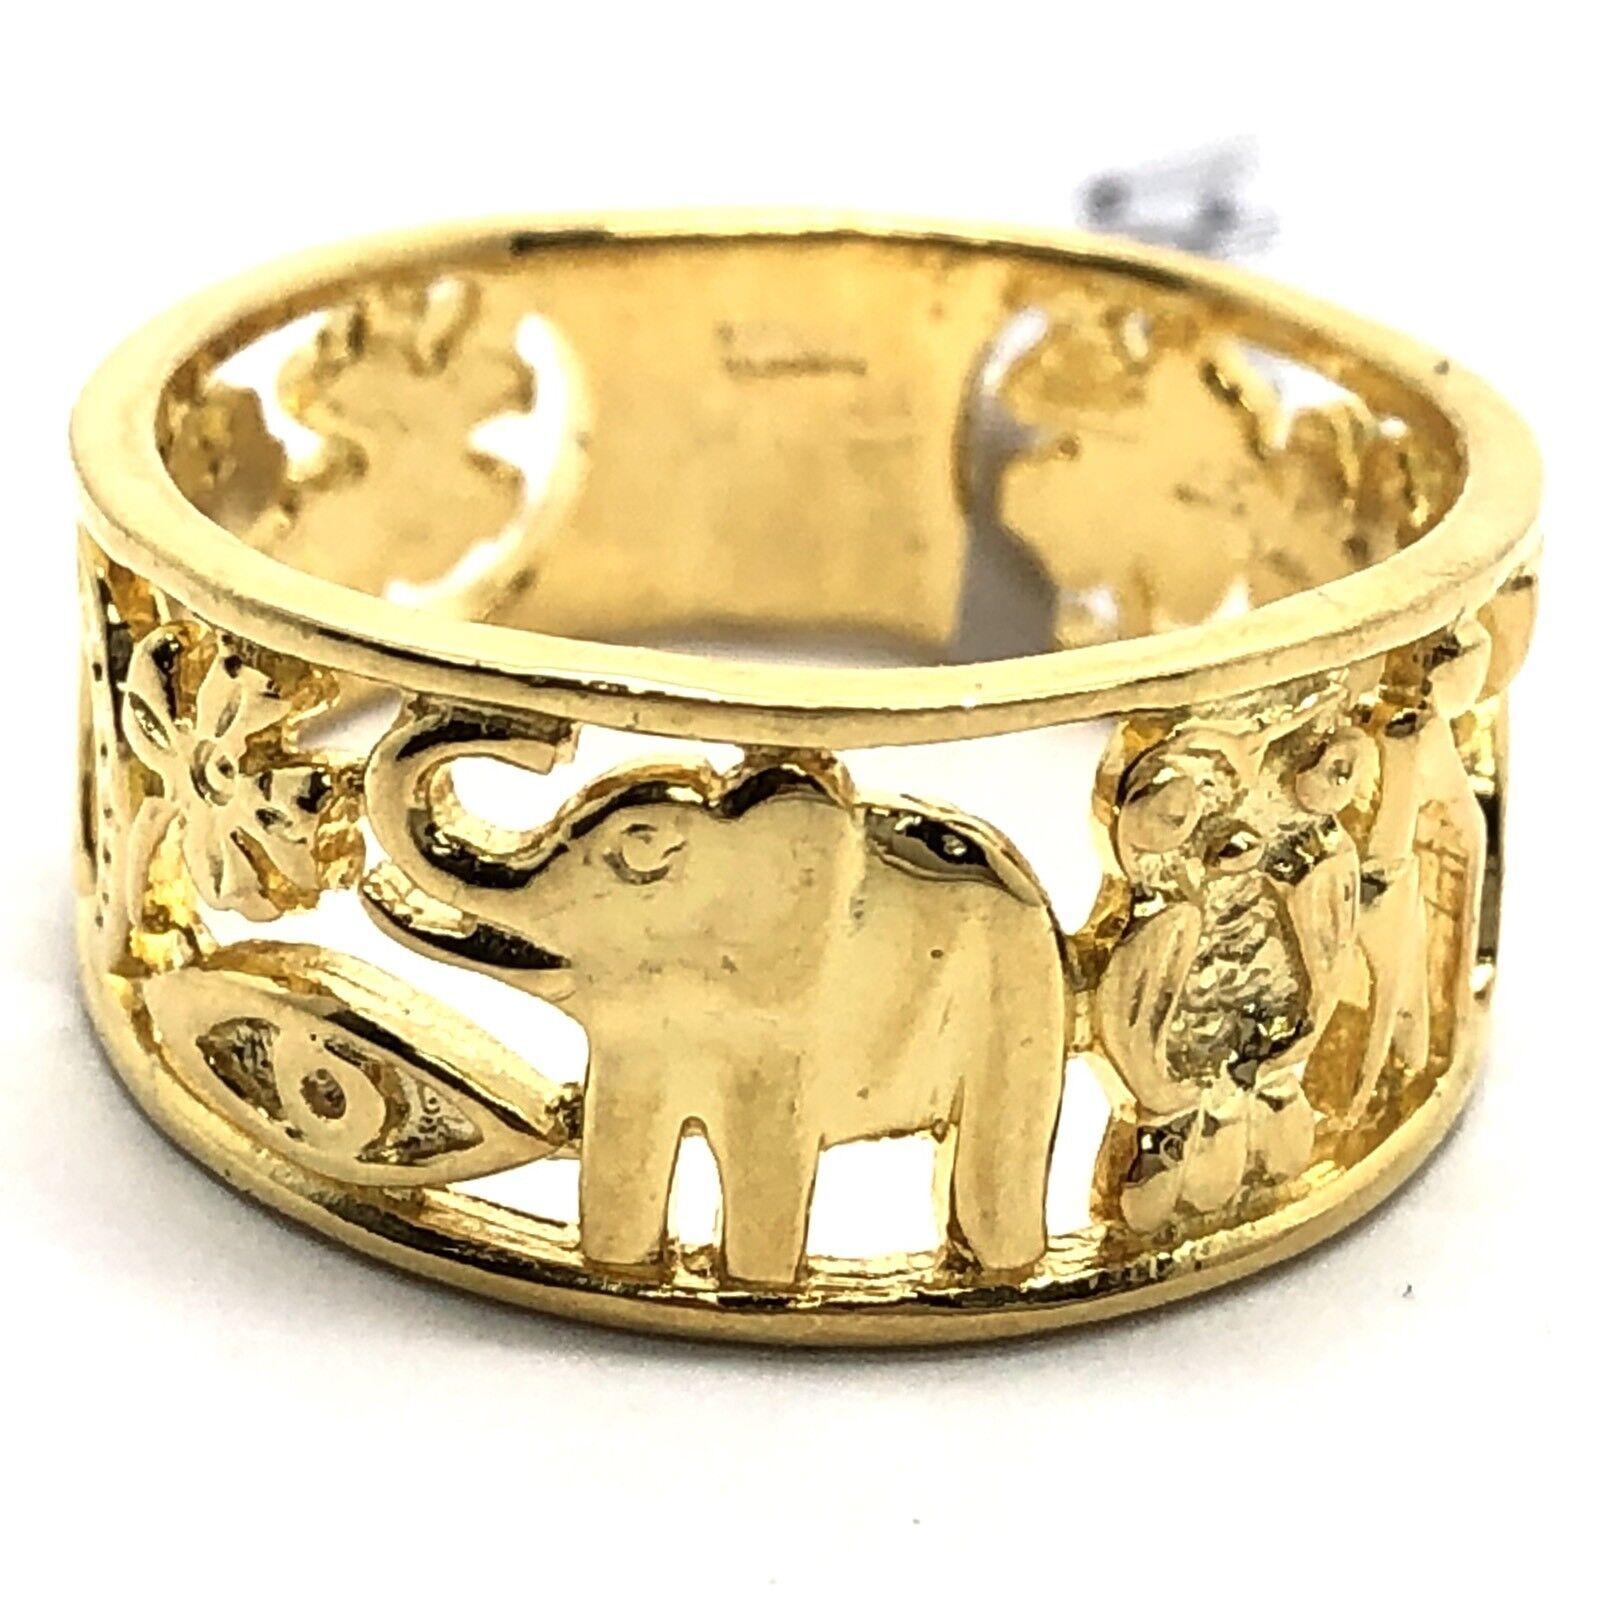 55d6fcdaab68f 18k Yellow gold Elephant Ring 4.61 grams uuop492143088-Precious ...